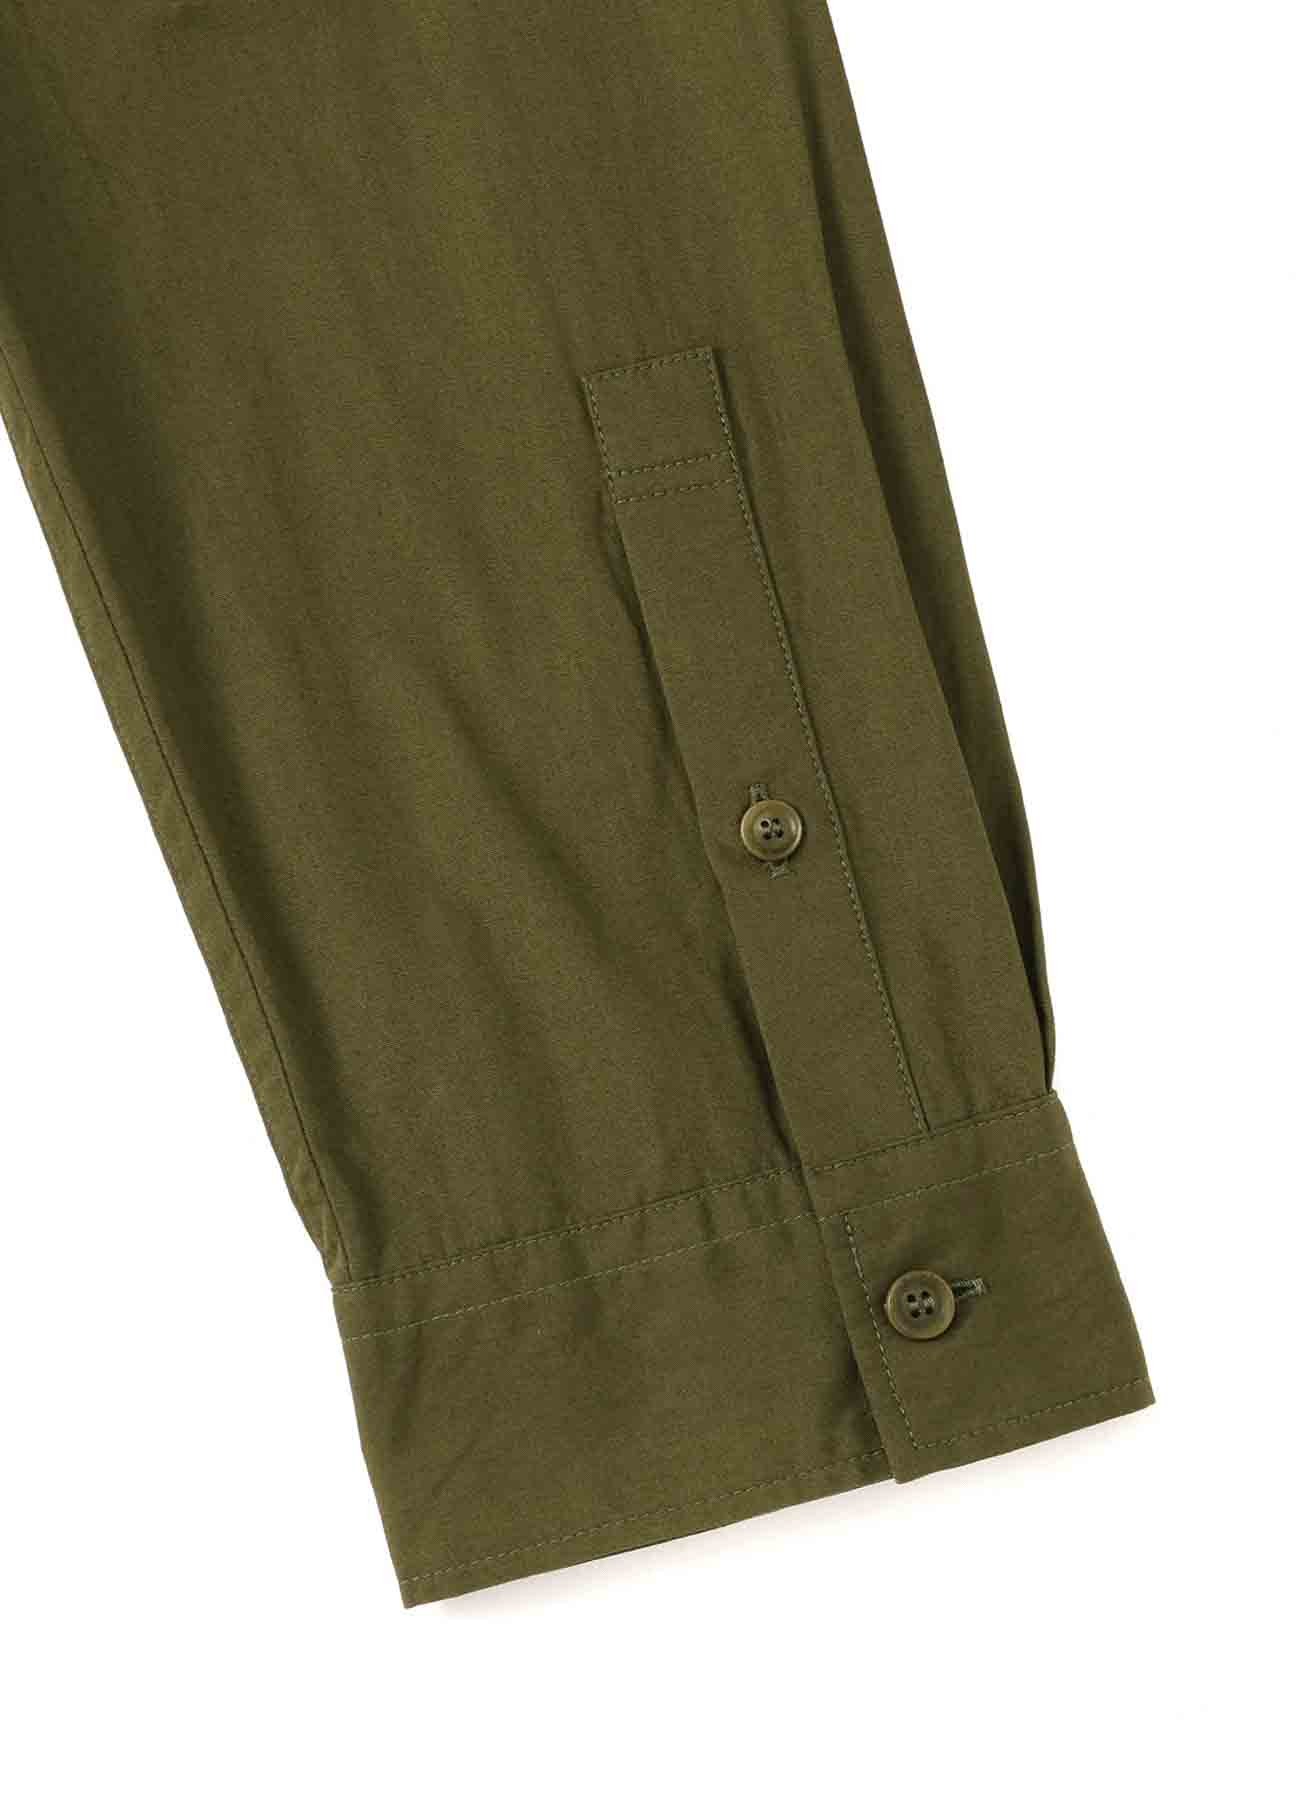 40/2 Cotton Broad Double Collar Big Shirt